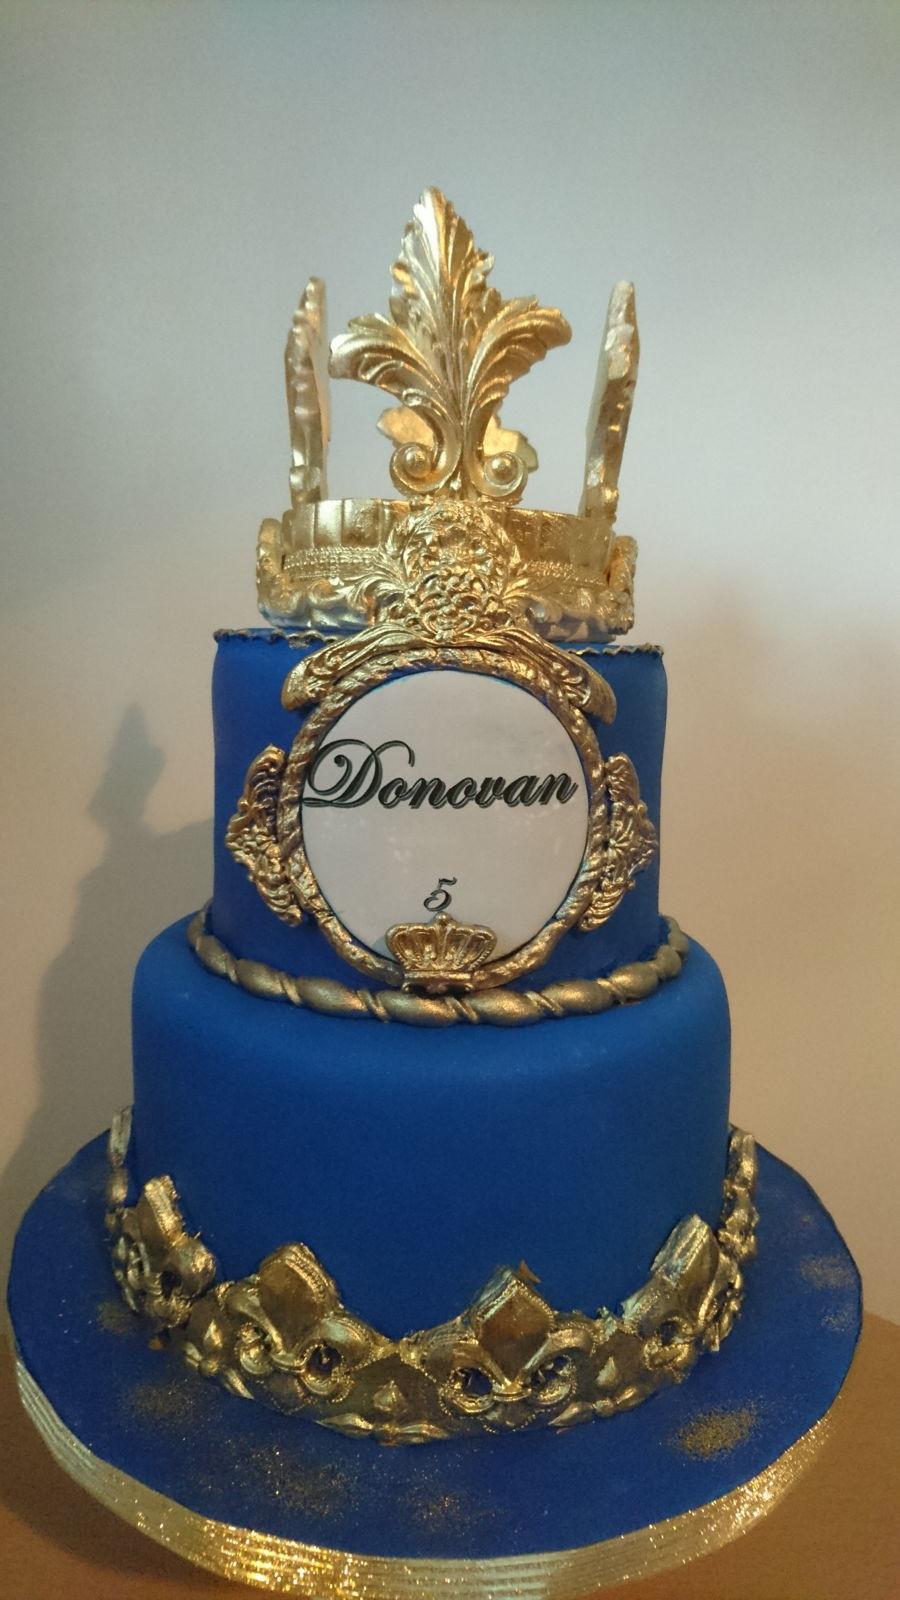 Royal Blue And Gold Wedding Cakes  Donovan Cake Royal Cake Blue And Gold CakeCentral